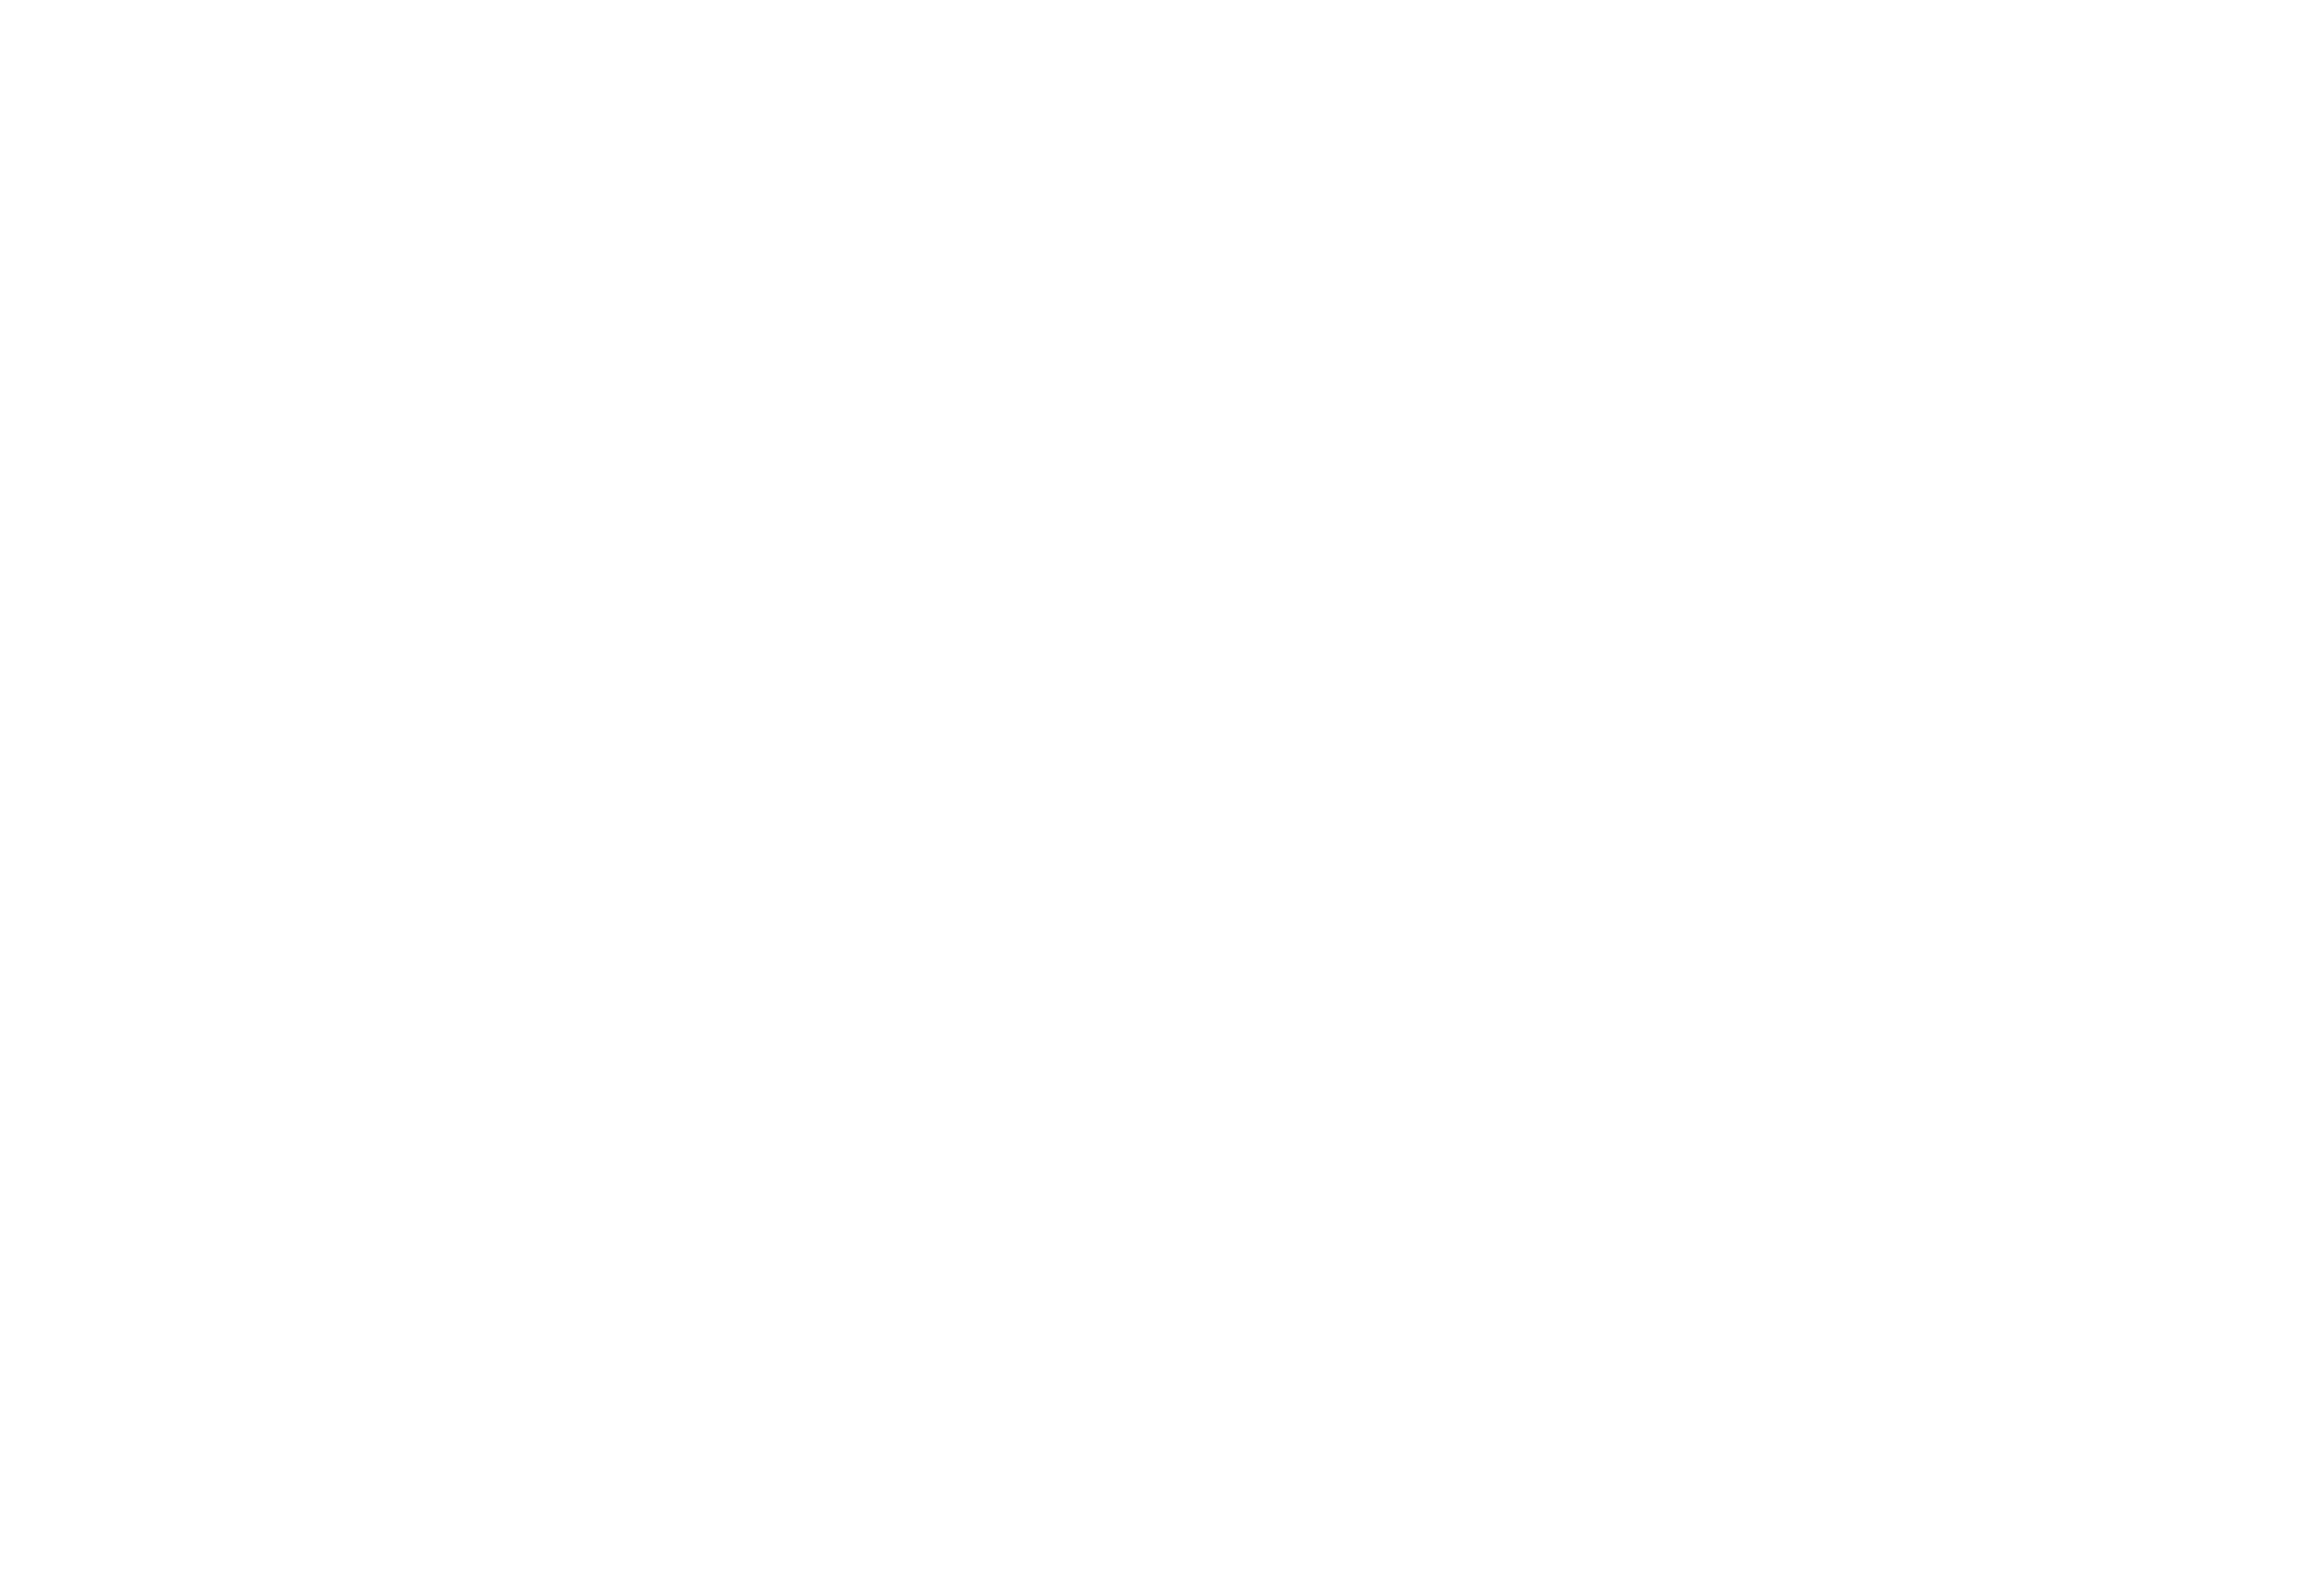 Wilson Chamber of Commerce